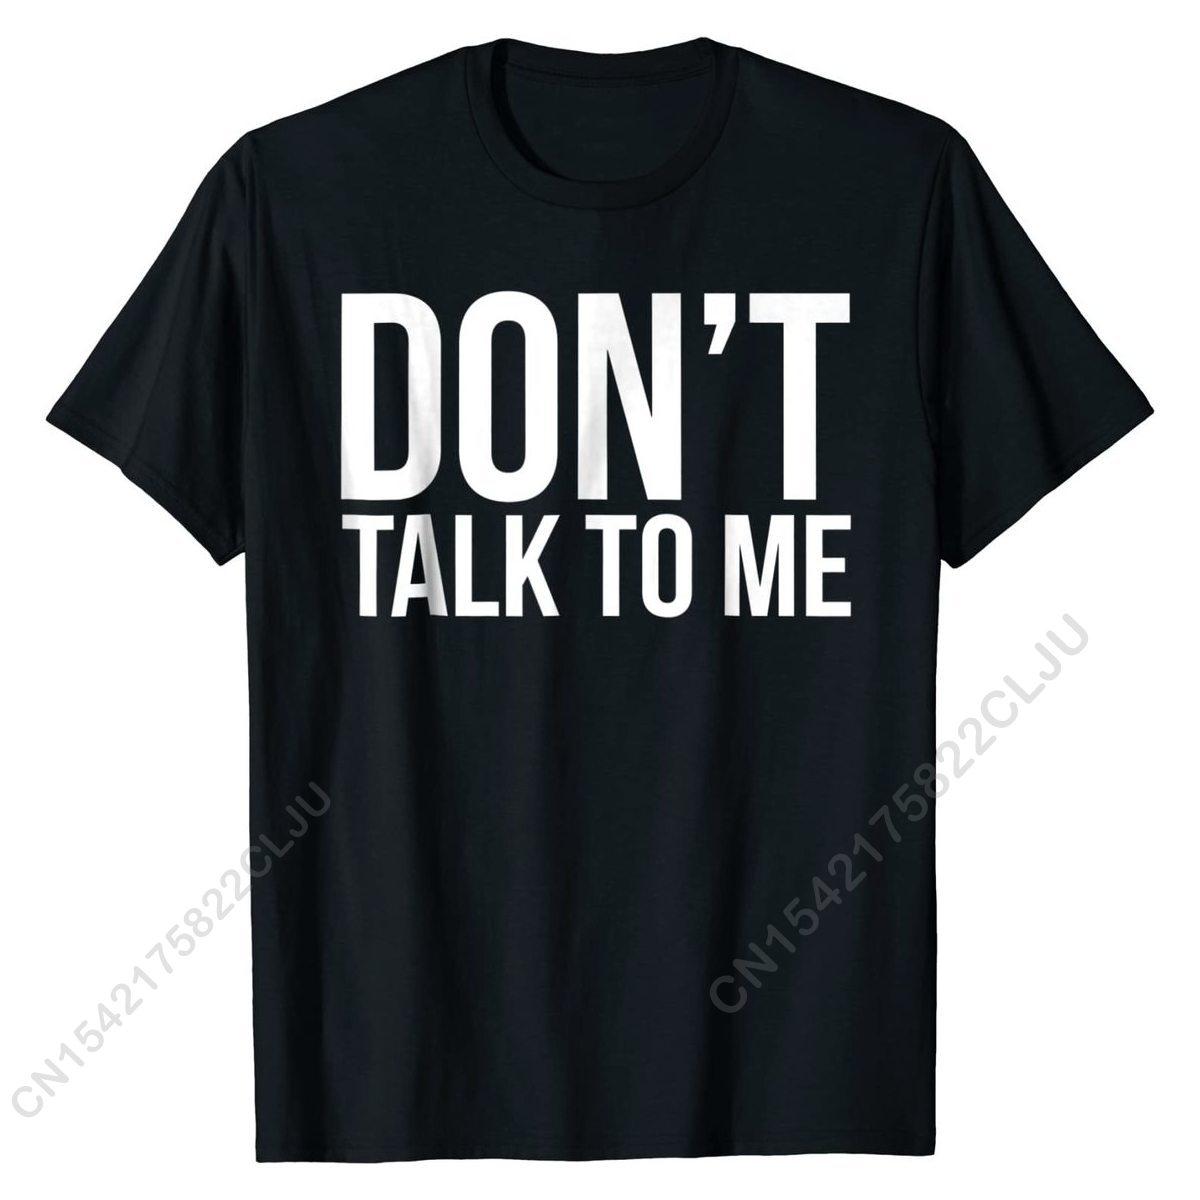 Funny T-shirt - Don't Talk To Me Top T-shirts Design Hot Sale Men's Tops Shirt Design Cotton khaki crushed velvet flounced design t shirt sweatpant bundle